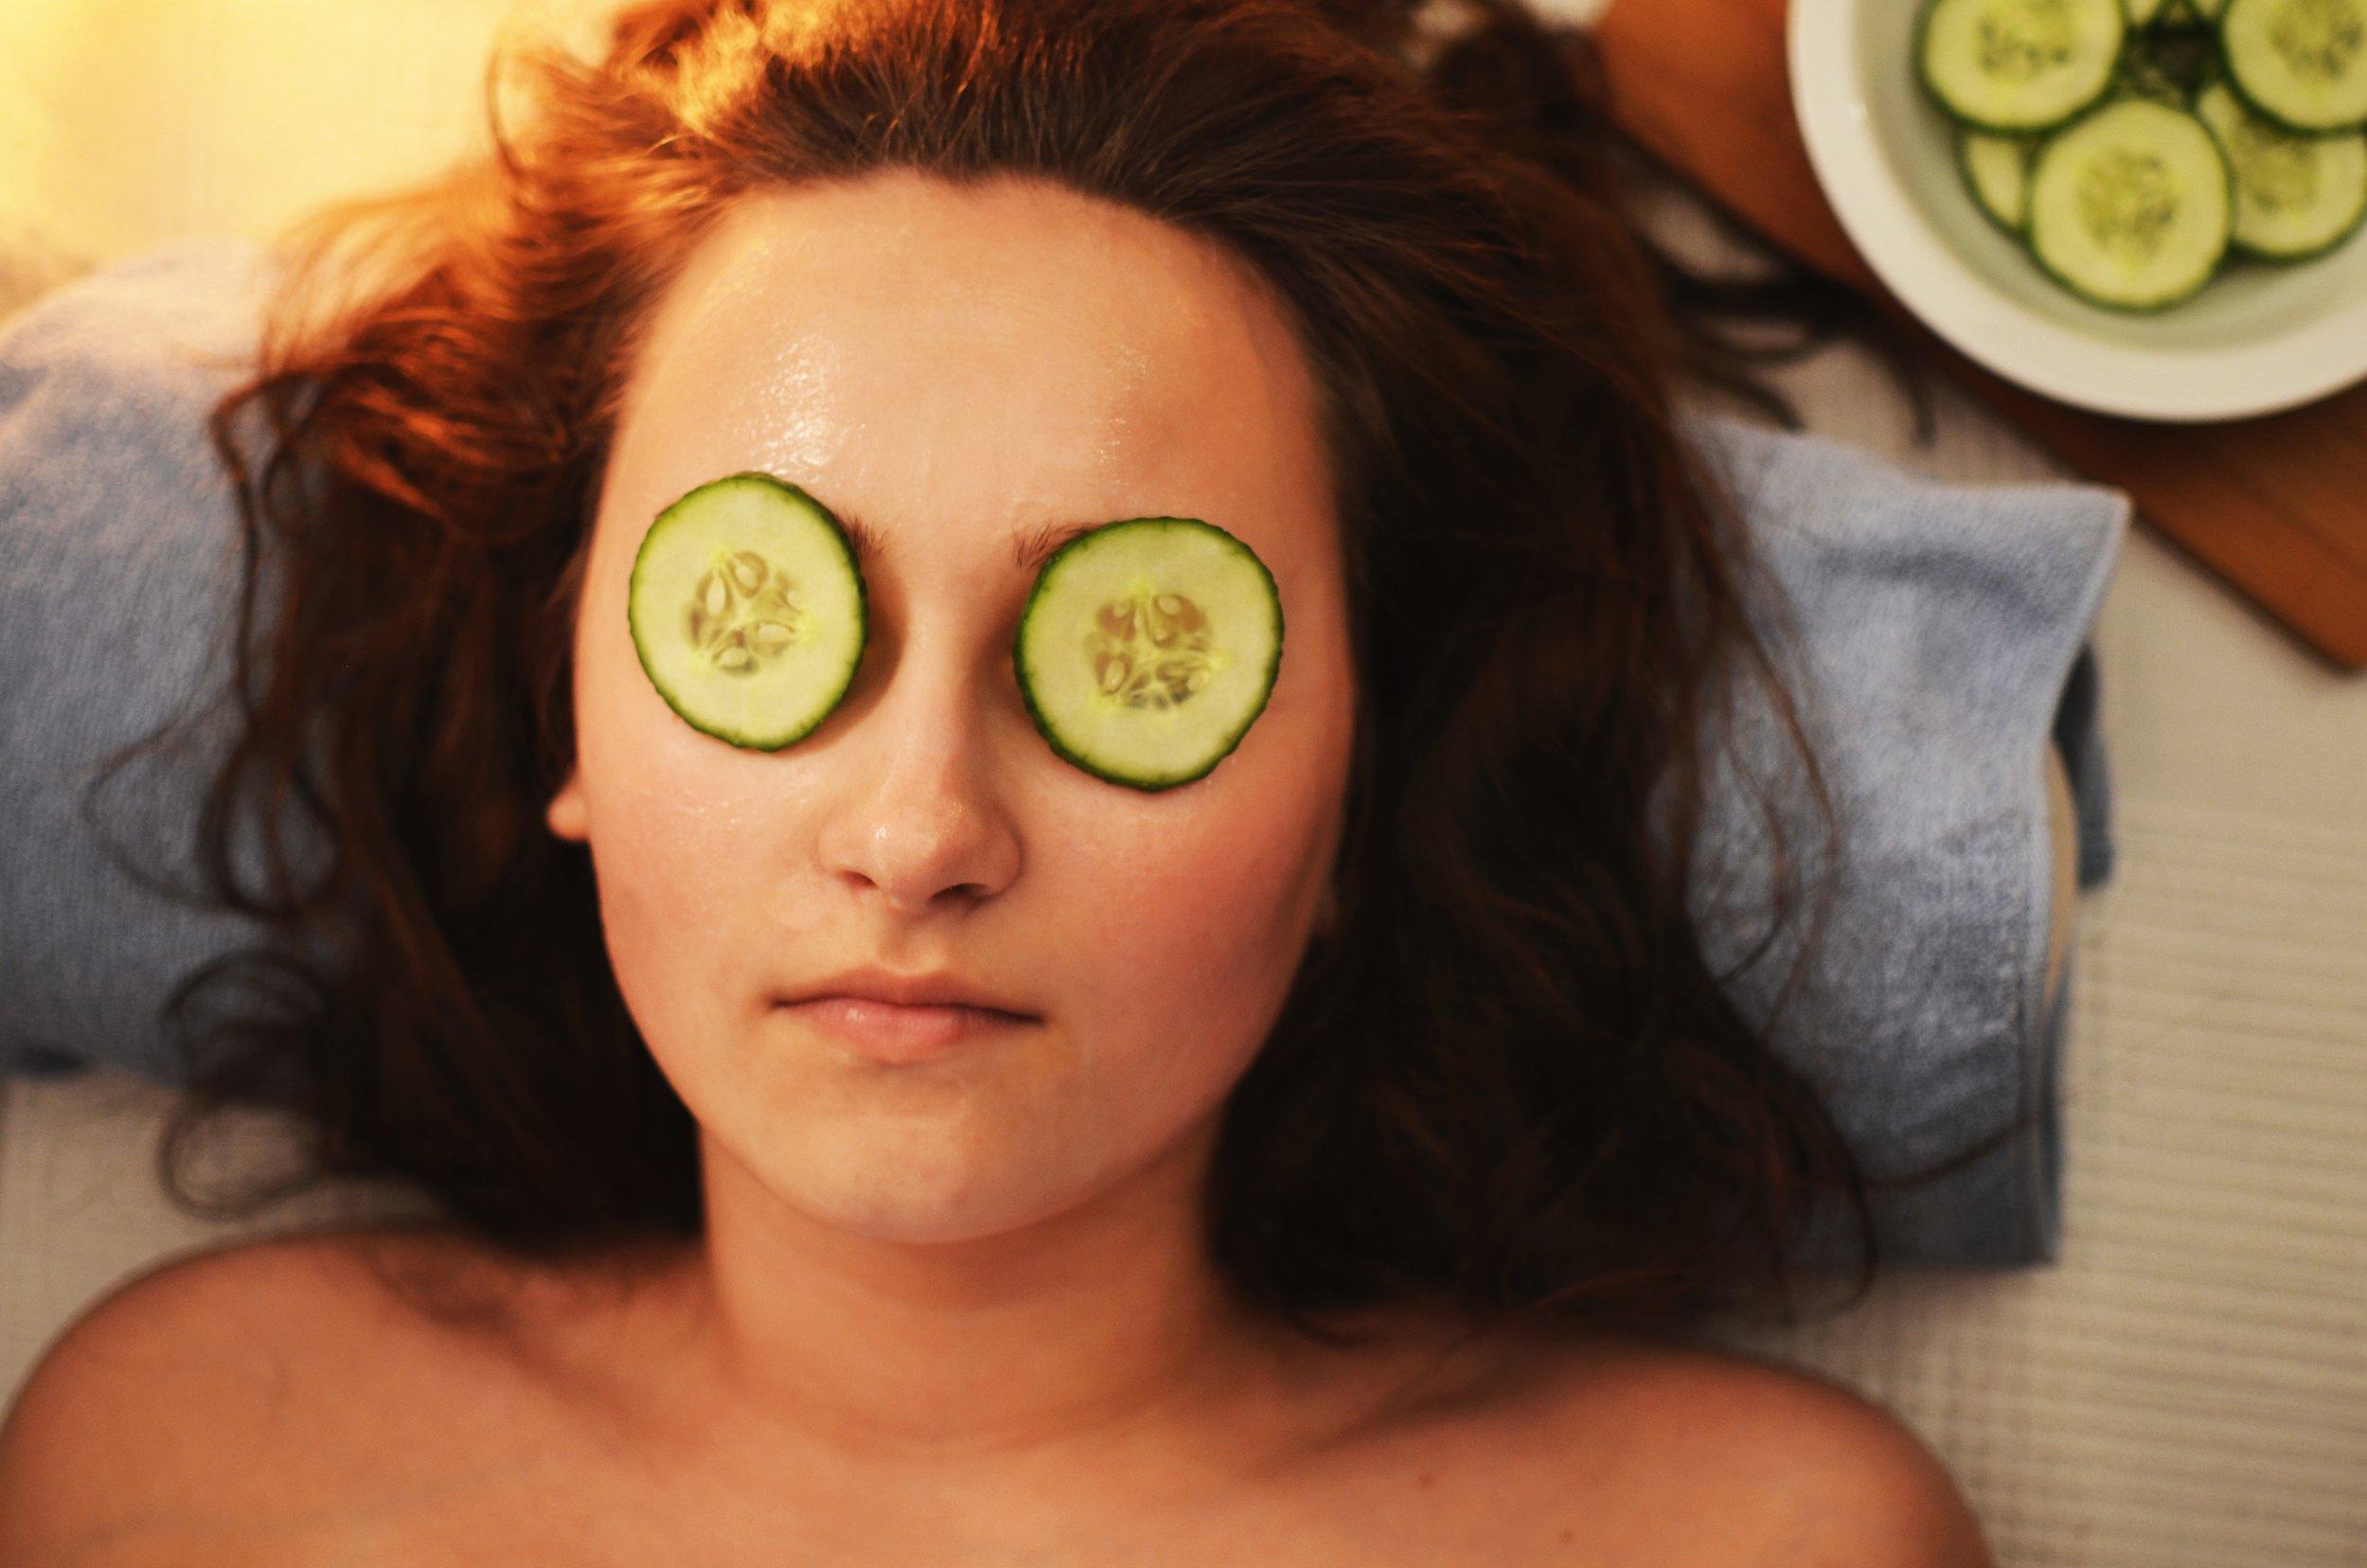 beauty-cucumber-facial-3192.jpg